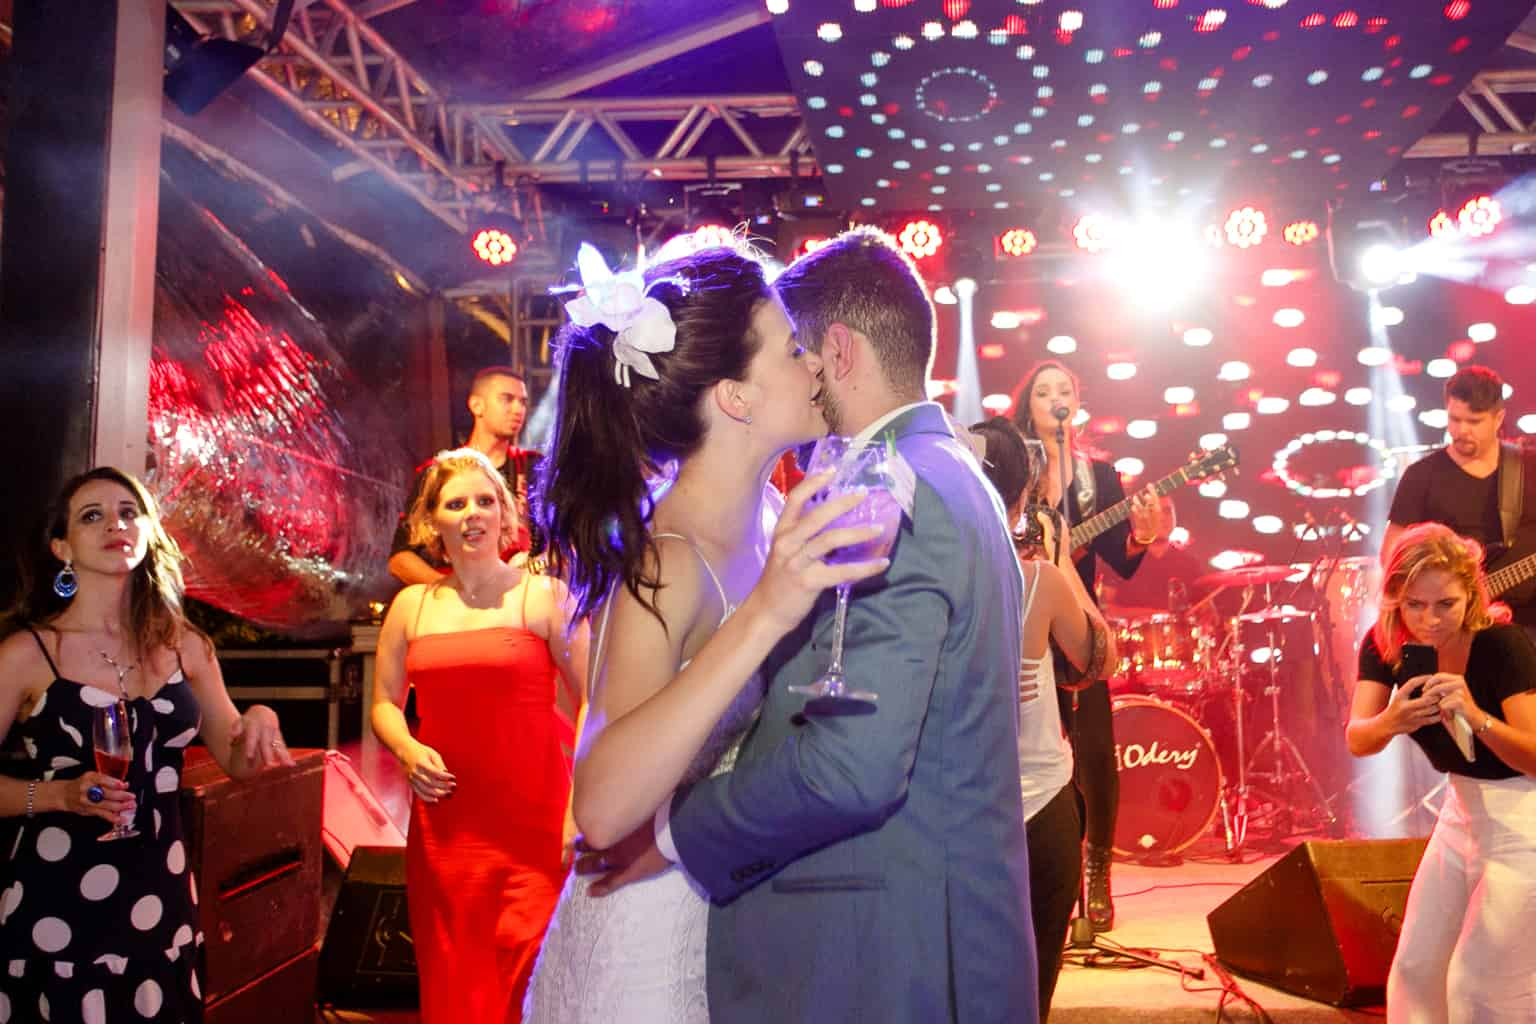 Casamento-Emanuelle-e-Alysson-Fotografia-Tadeu-Nanó-e-Luca-Antunes164